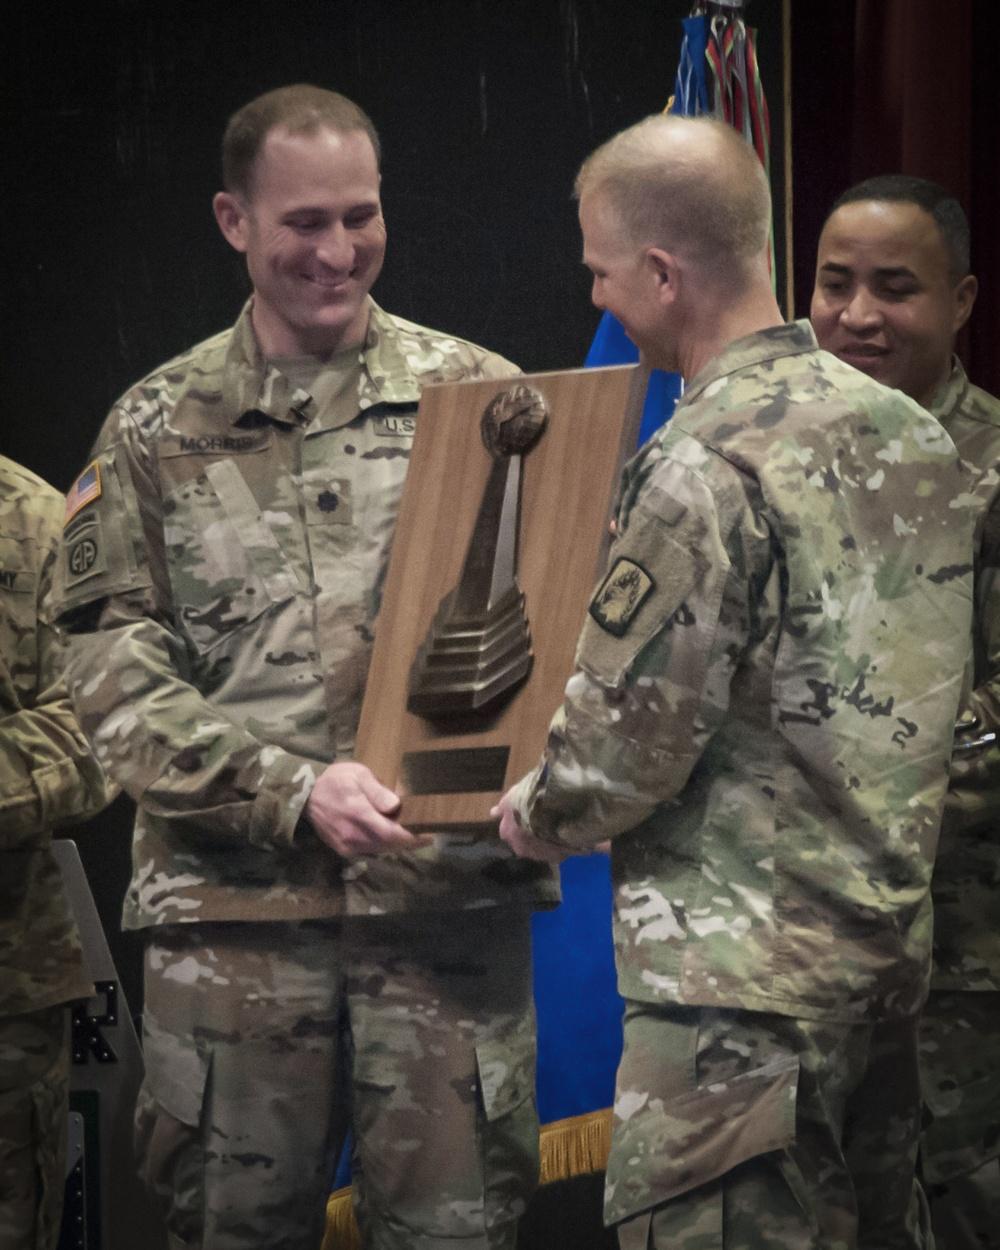 1-3rd Attack Reconnaissance Battalion, receives Lt. Gen. Ellis D. Parker Award in the Combat category